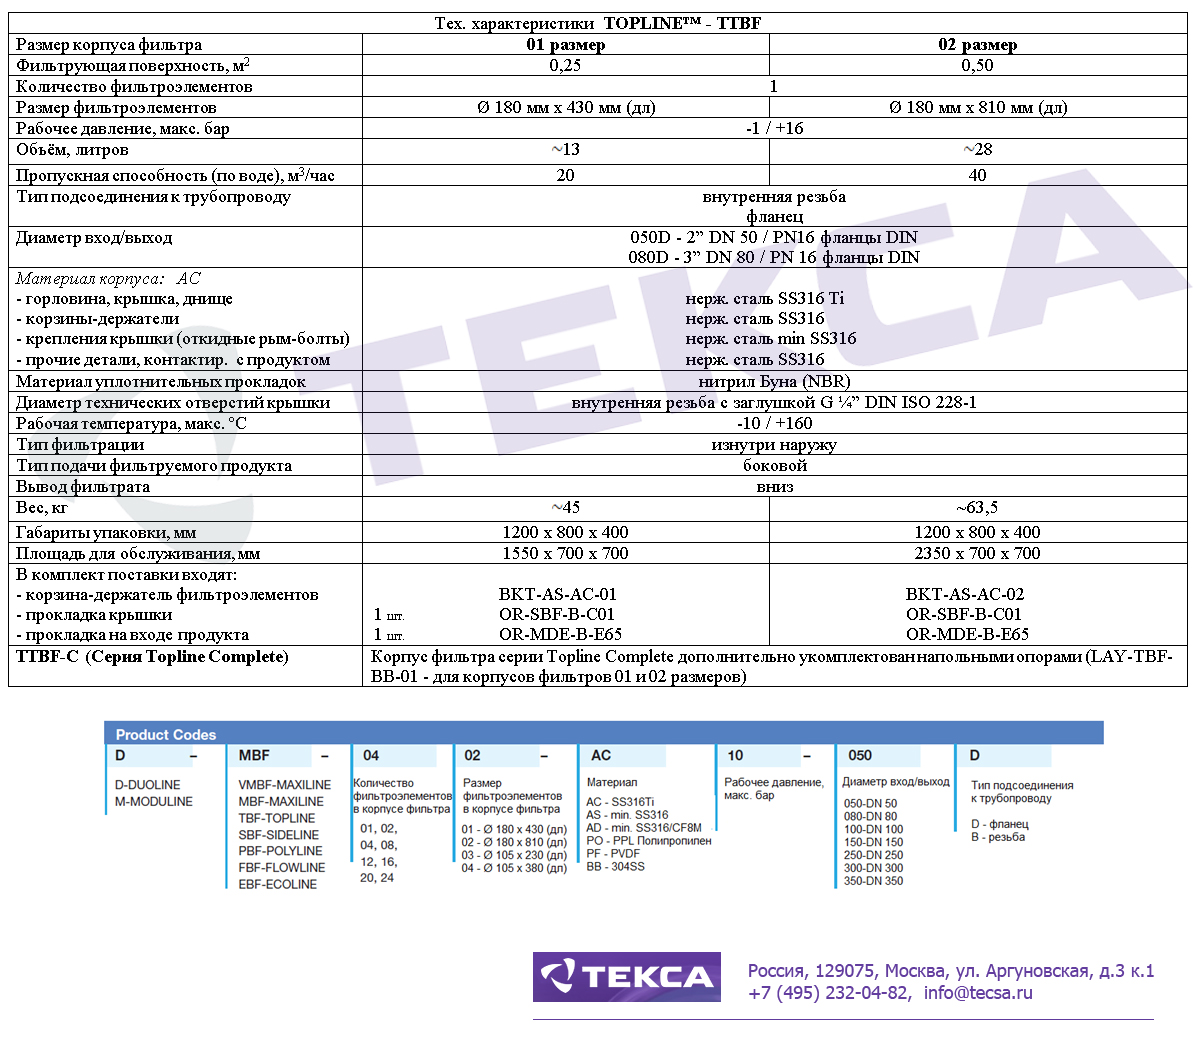 Технические характеристики корпуса фильтра TOPLINE -TTBF